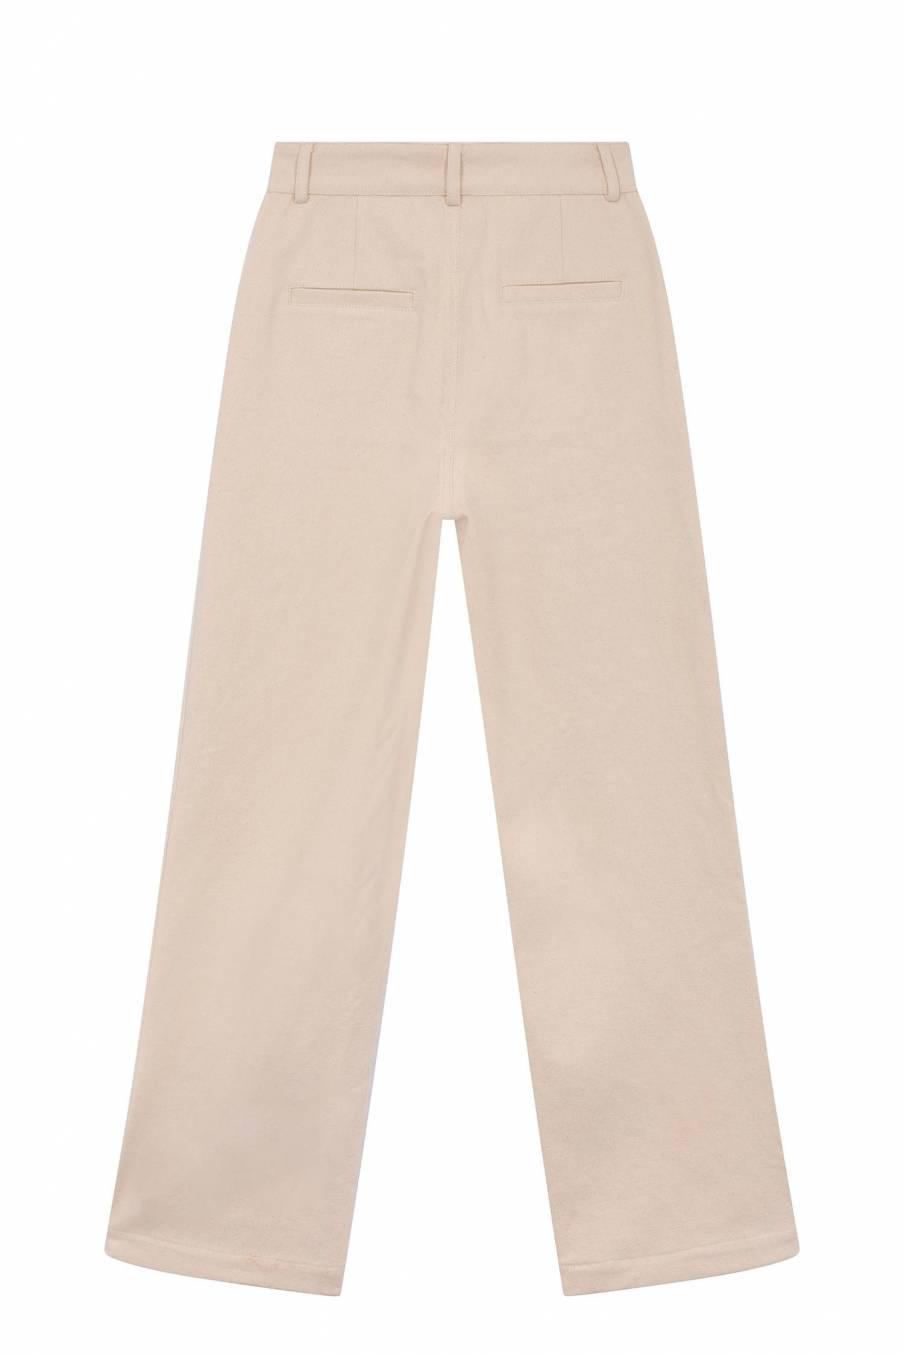 Jeans Malibu White